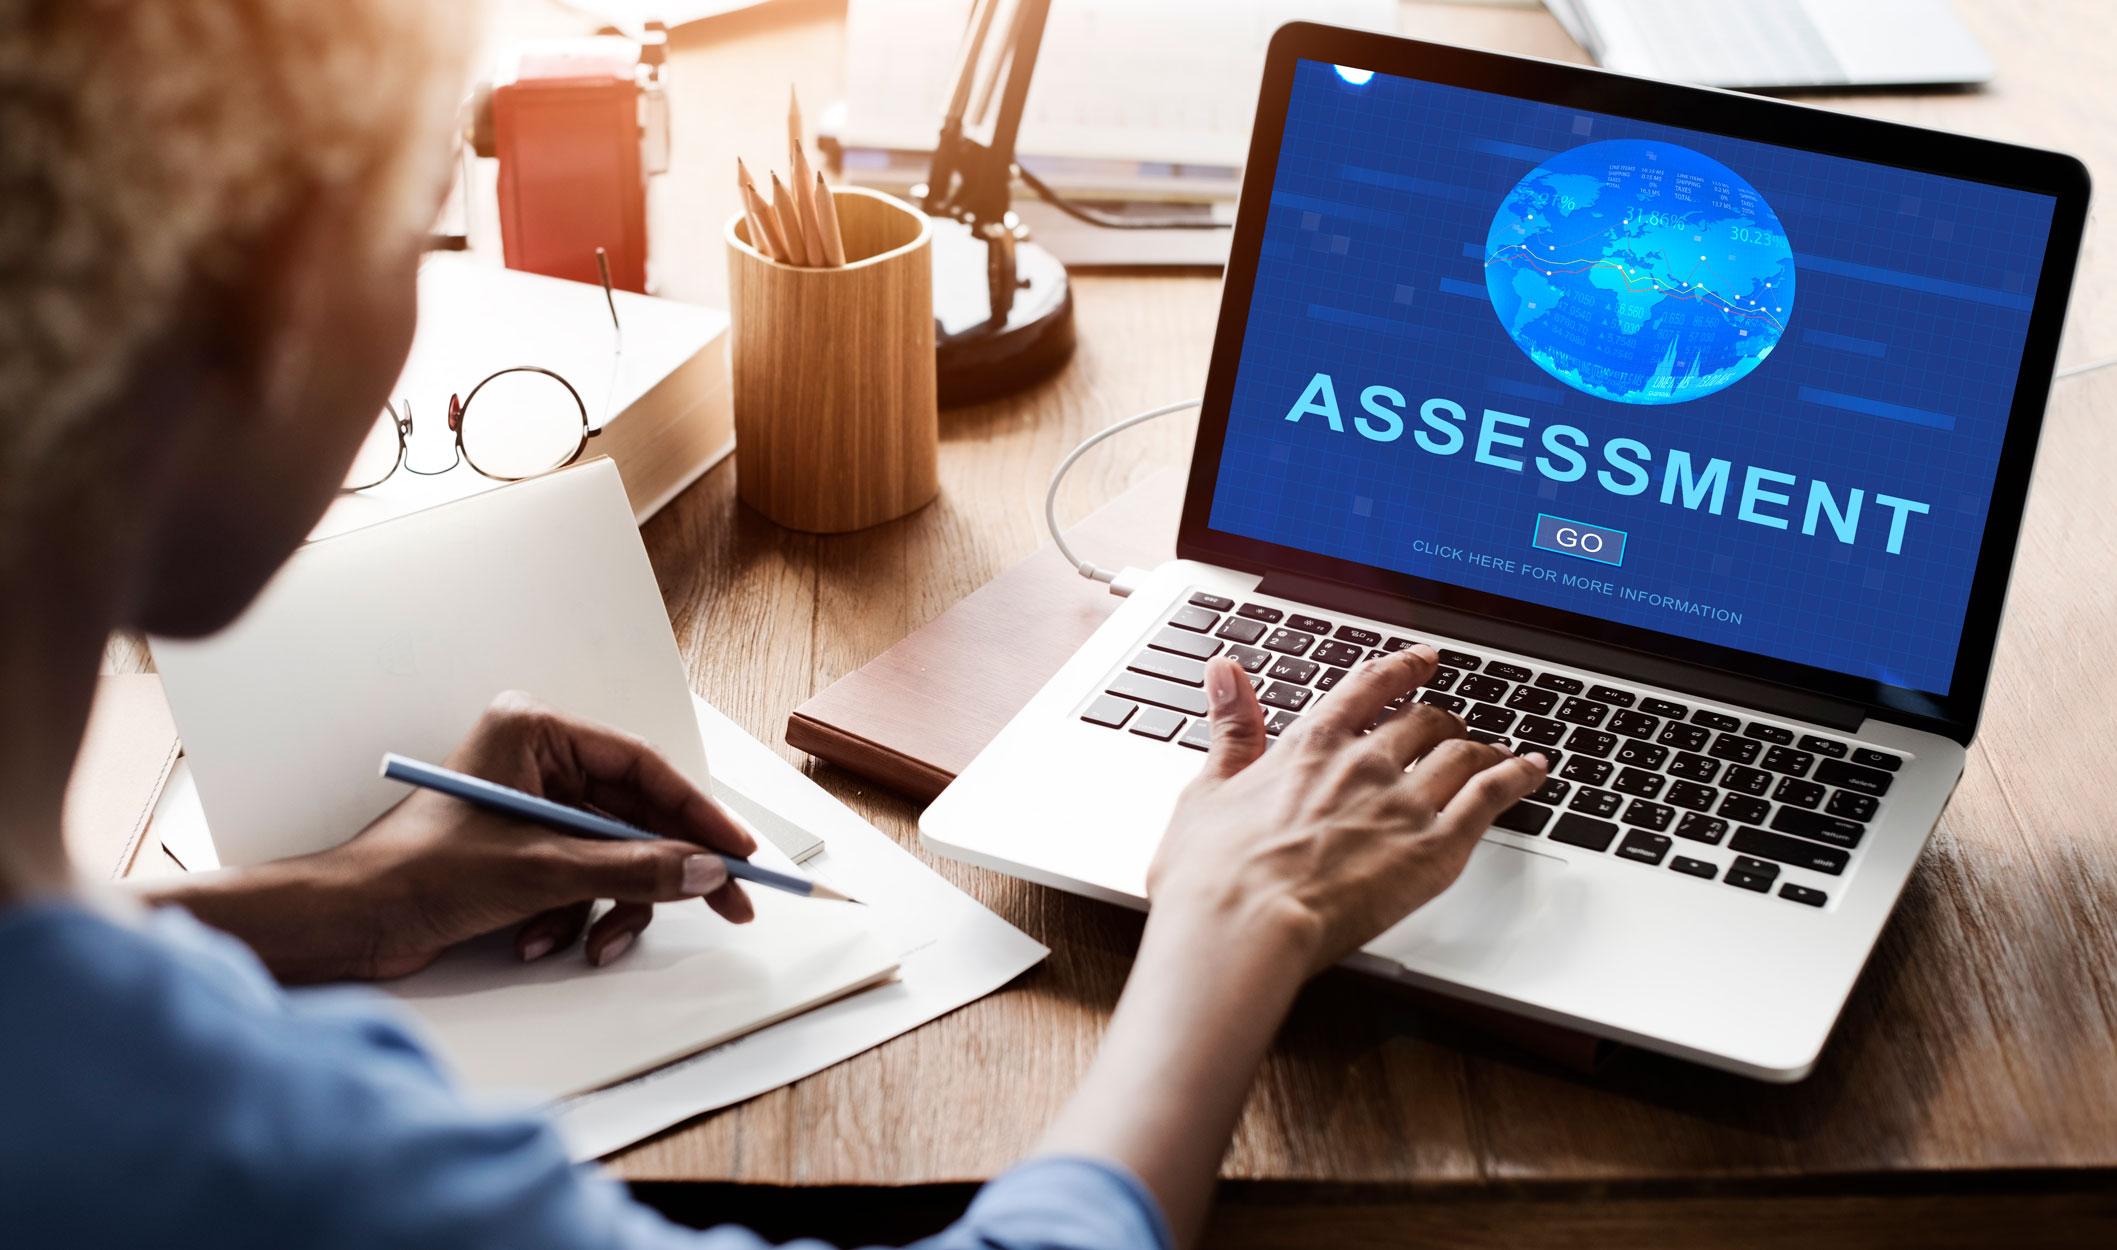 e-Learning-development-multilingual-DTP-multilingual-desktop-publishing-assessment-laptop-world-woman-typing-holding-pencil-papers-desk